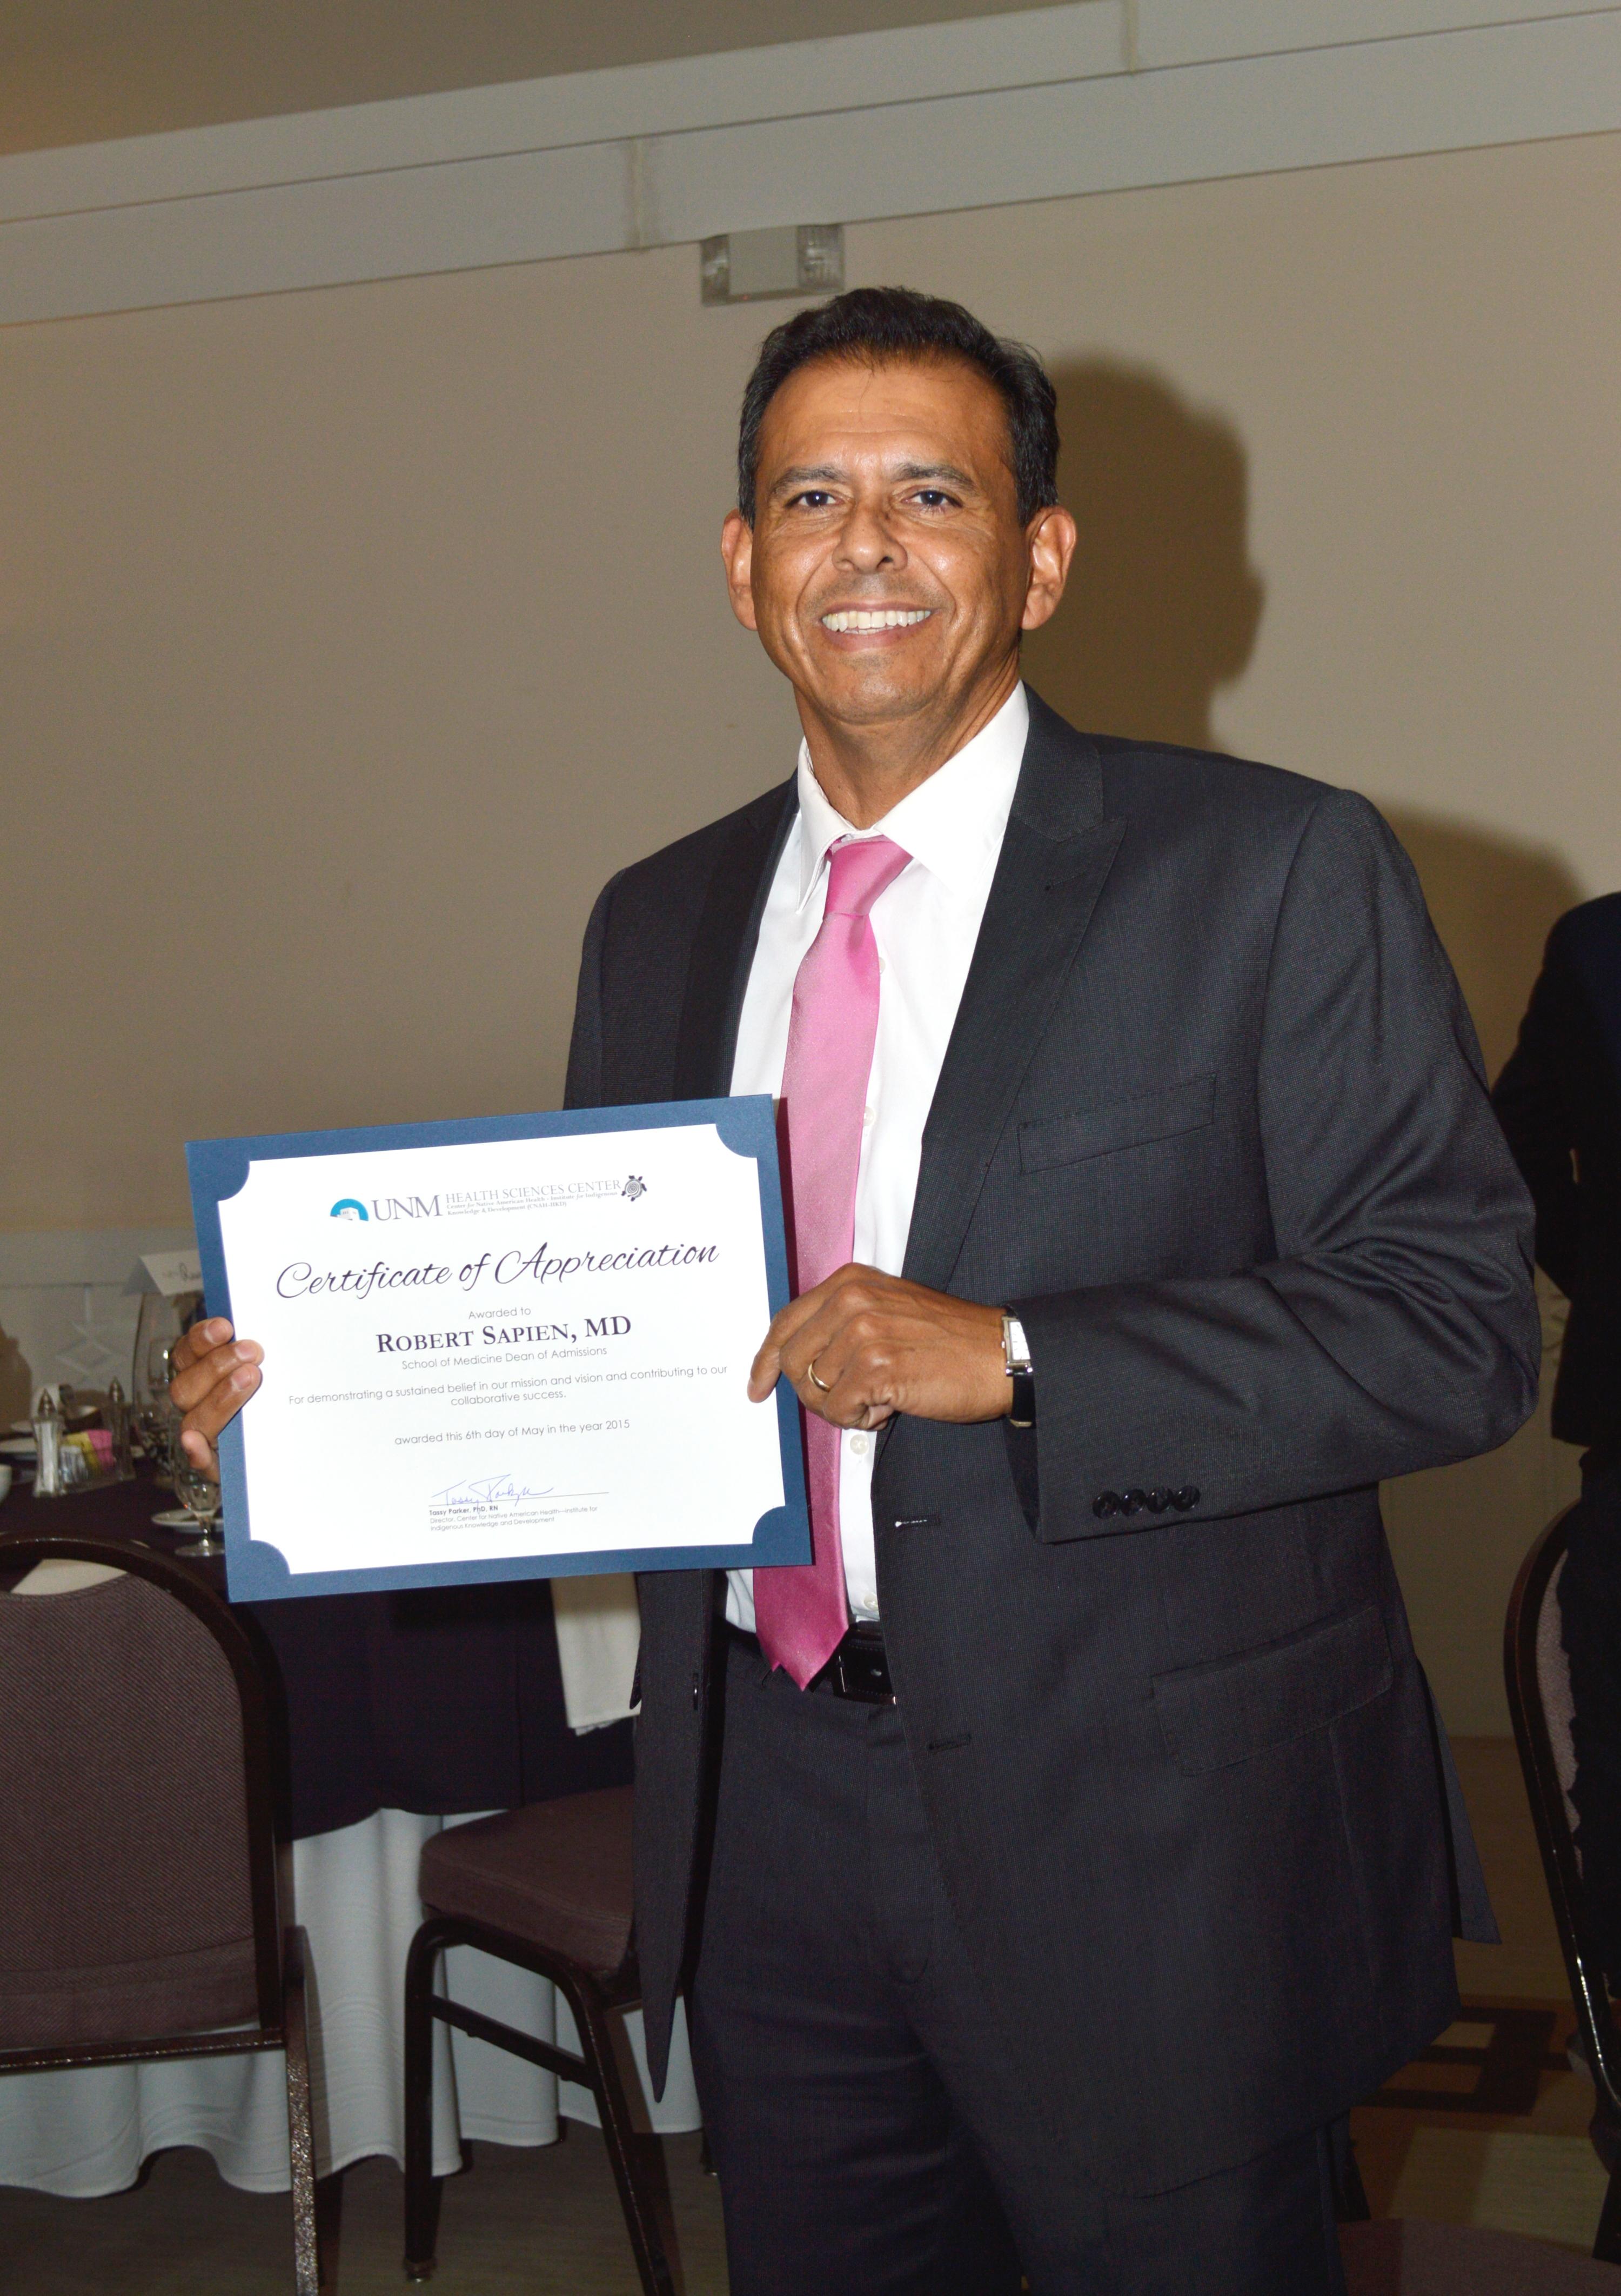 Robert con certificado.